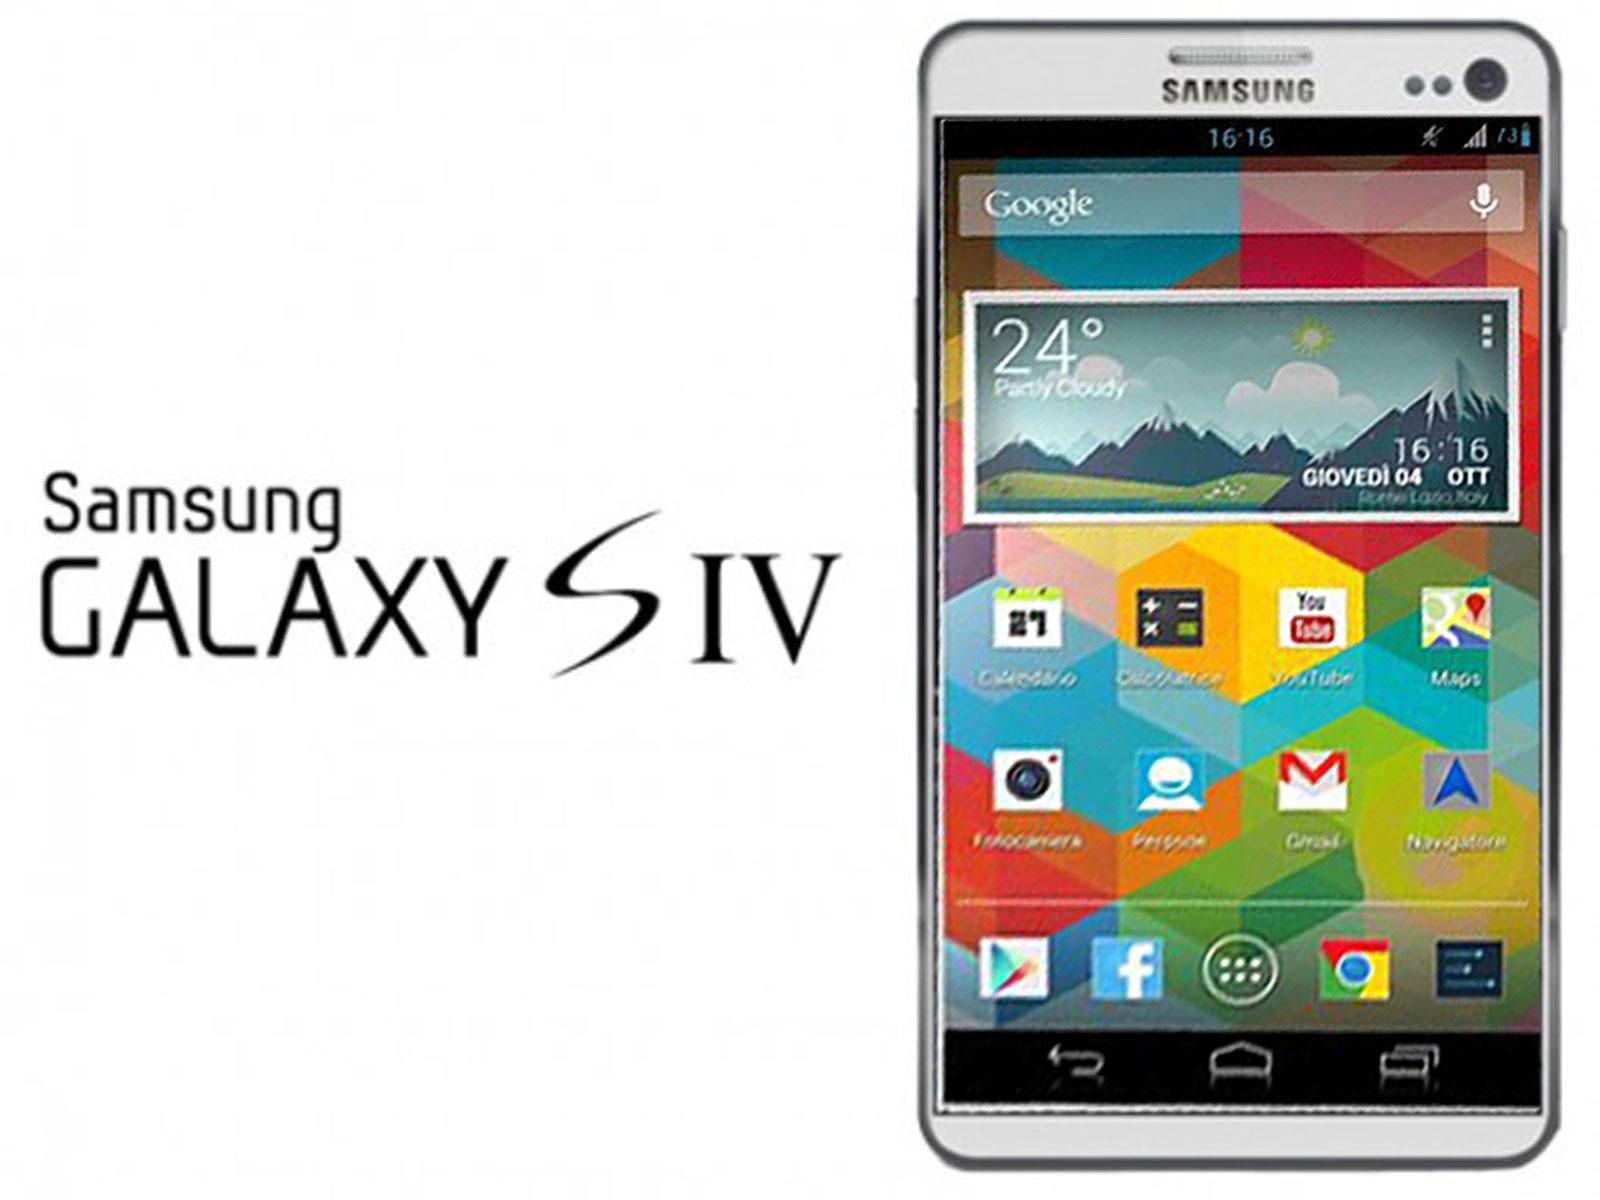 teknolojibirimi, galaxy s4